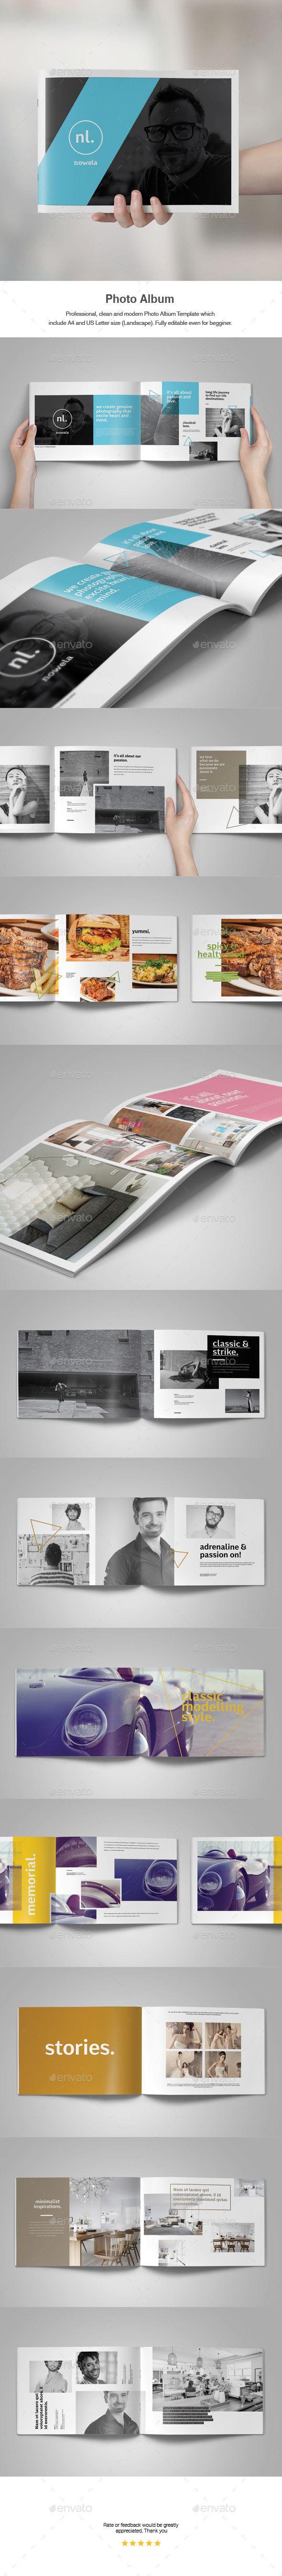 Photo Album Template  — InDesign Template #decor #portfolio • Download ➝ https://graphicriver.net/item/photo-album-template/18240535?ref=pxcr